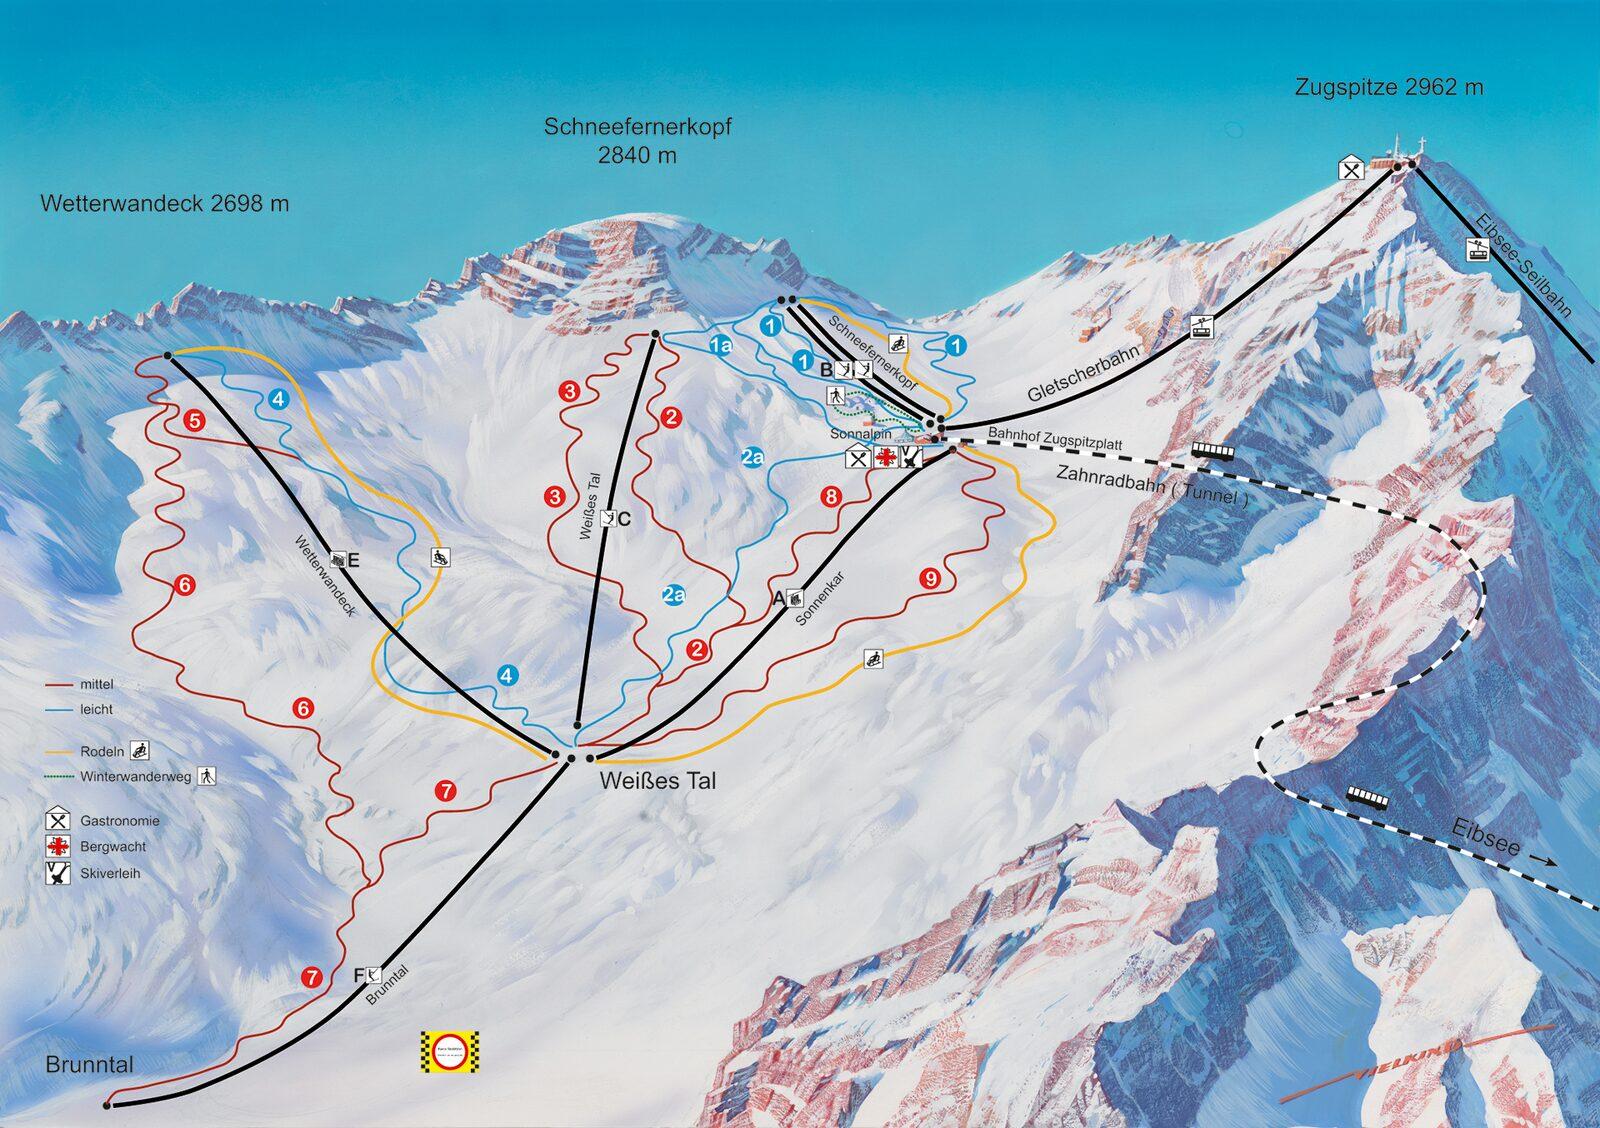 Pistekaart Zugspitze